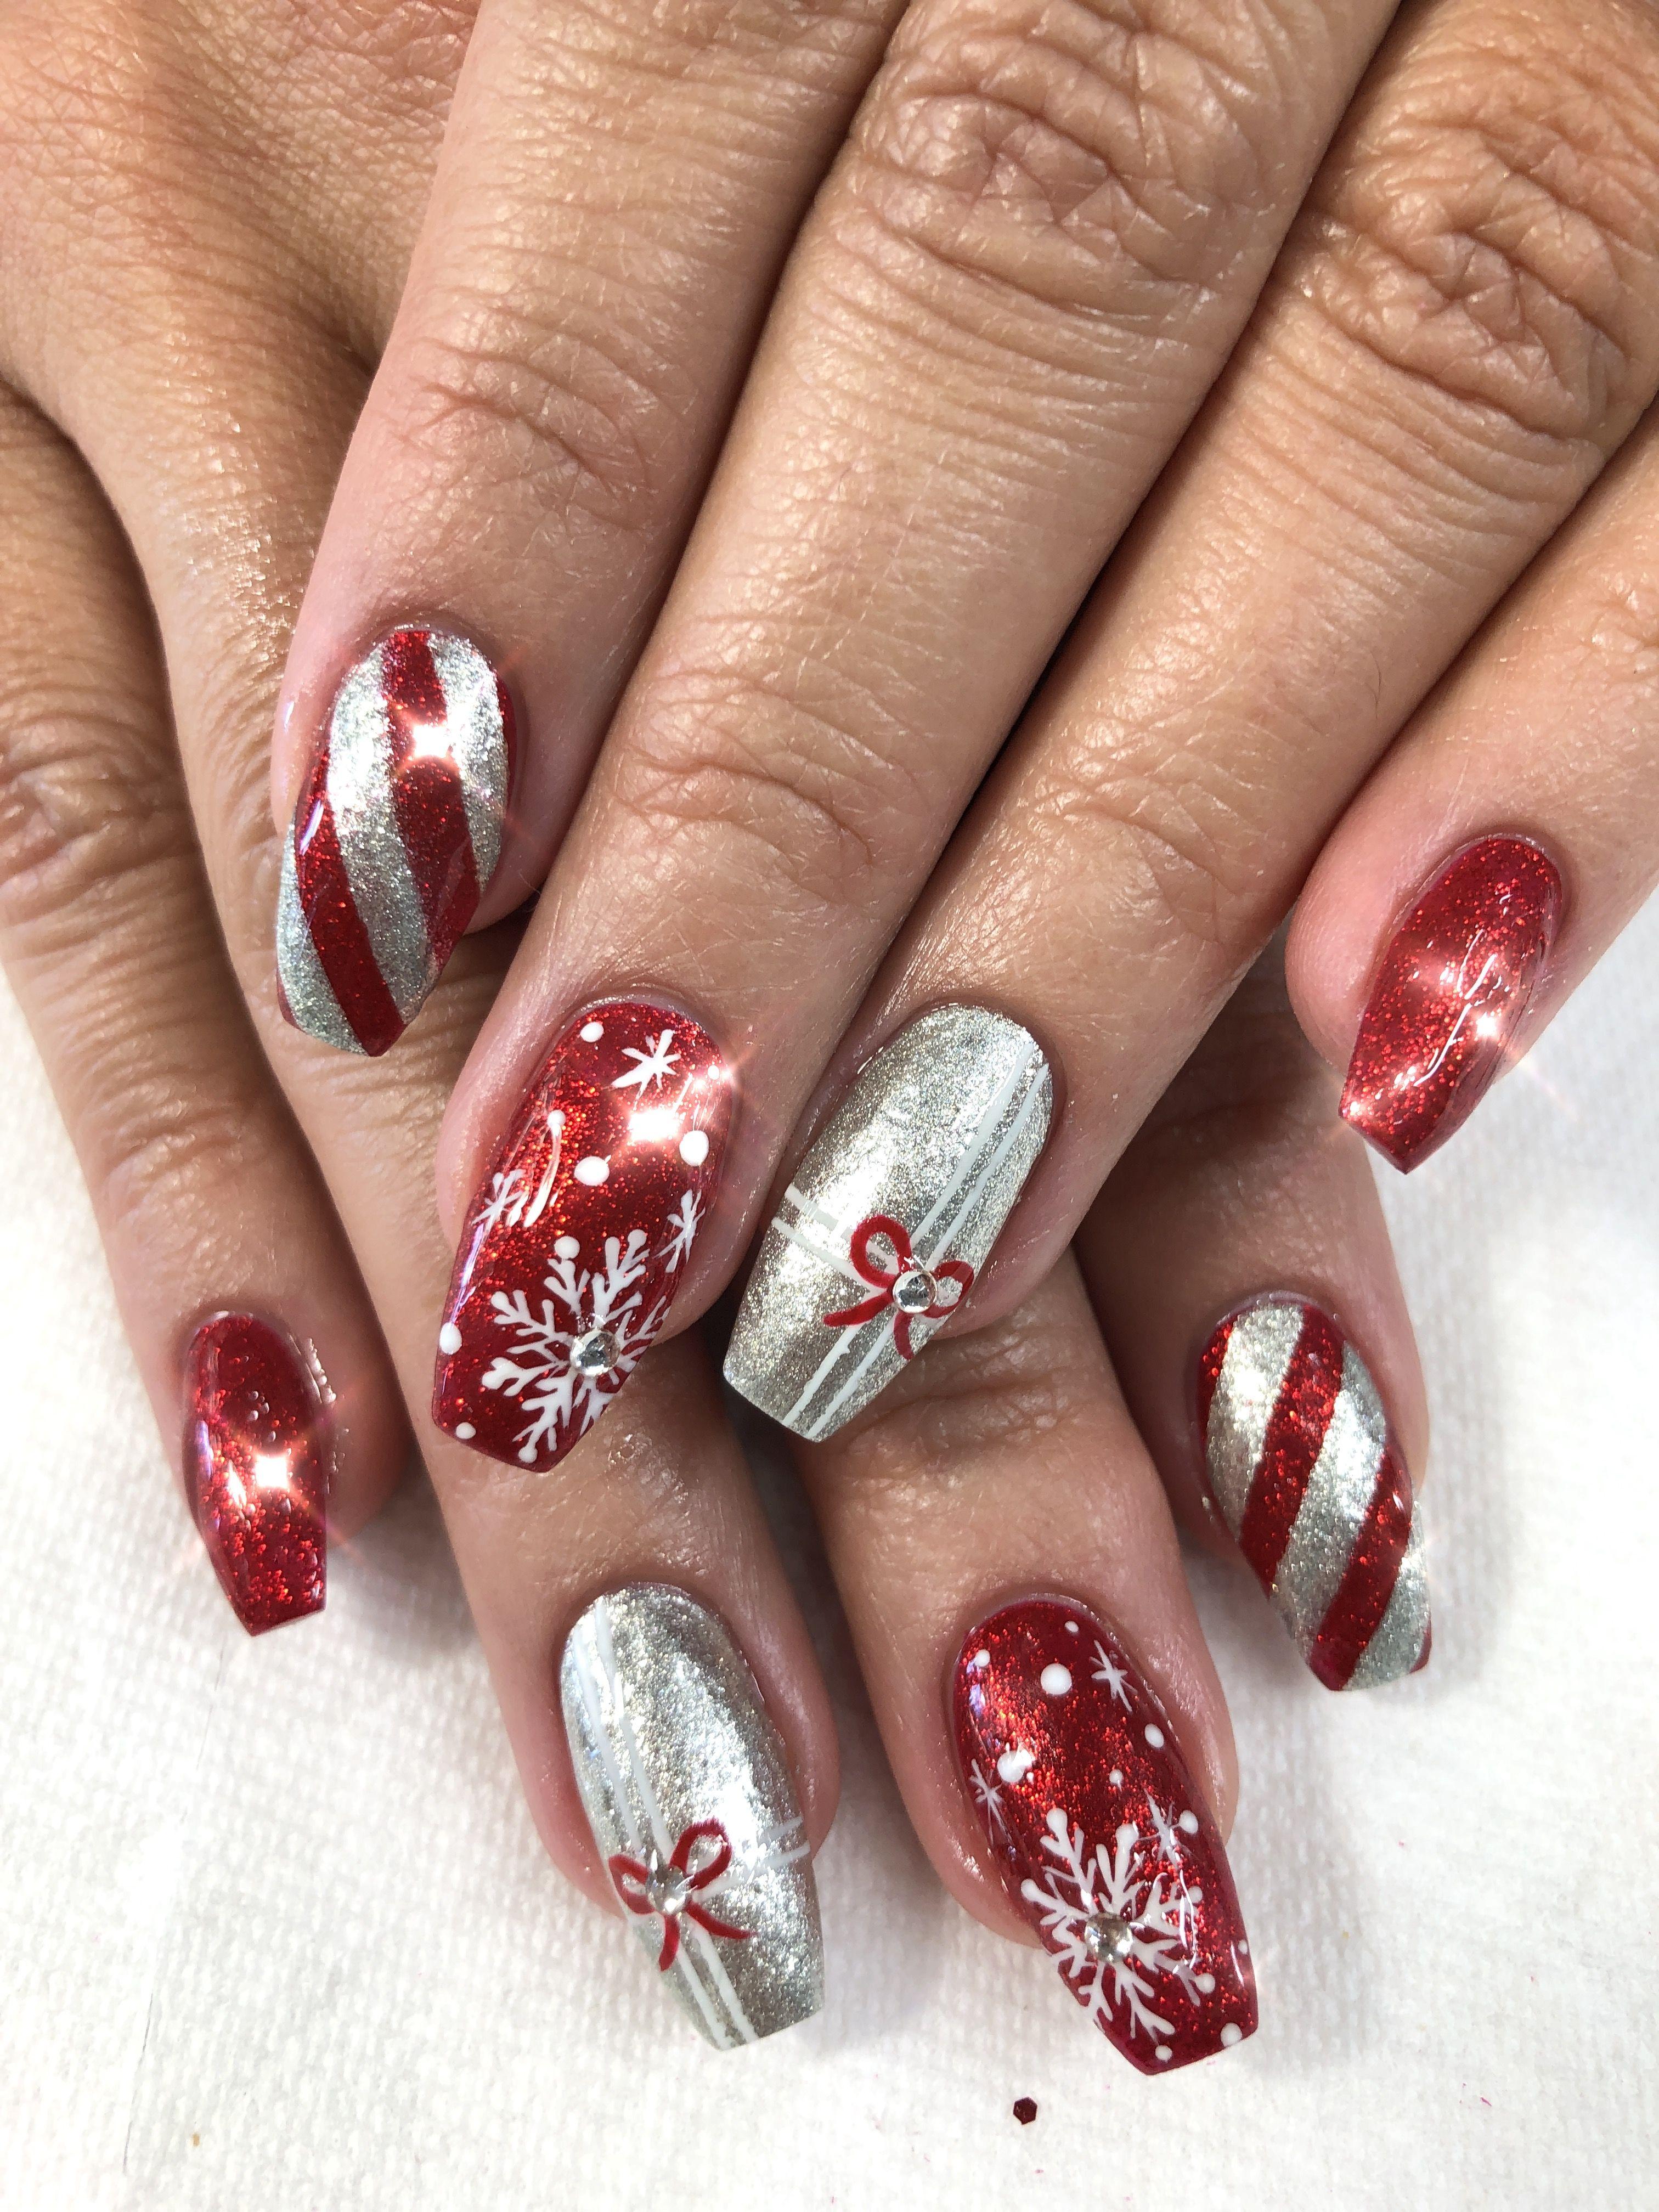 Christmas 2017 Nails #lasalonriiko #kokoist #christmasnails